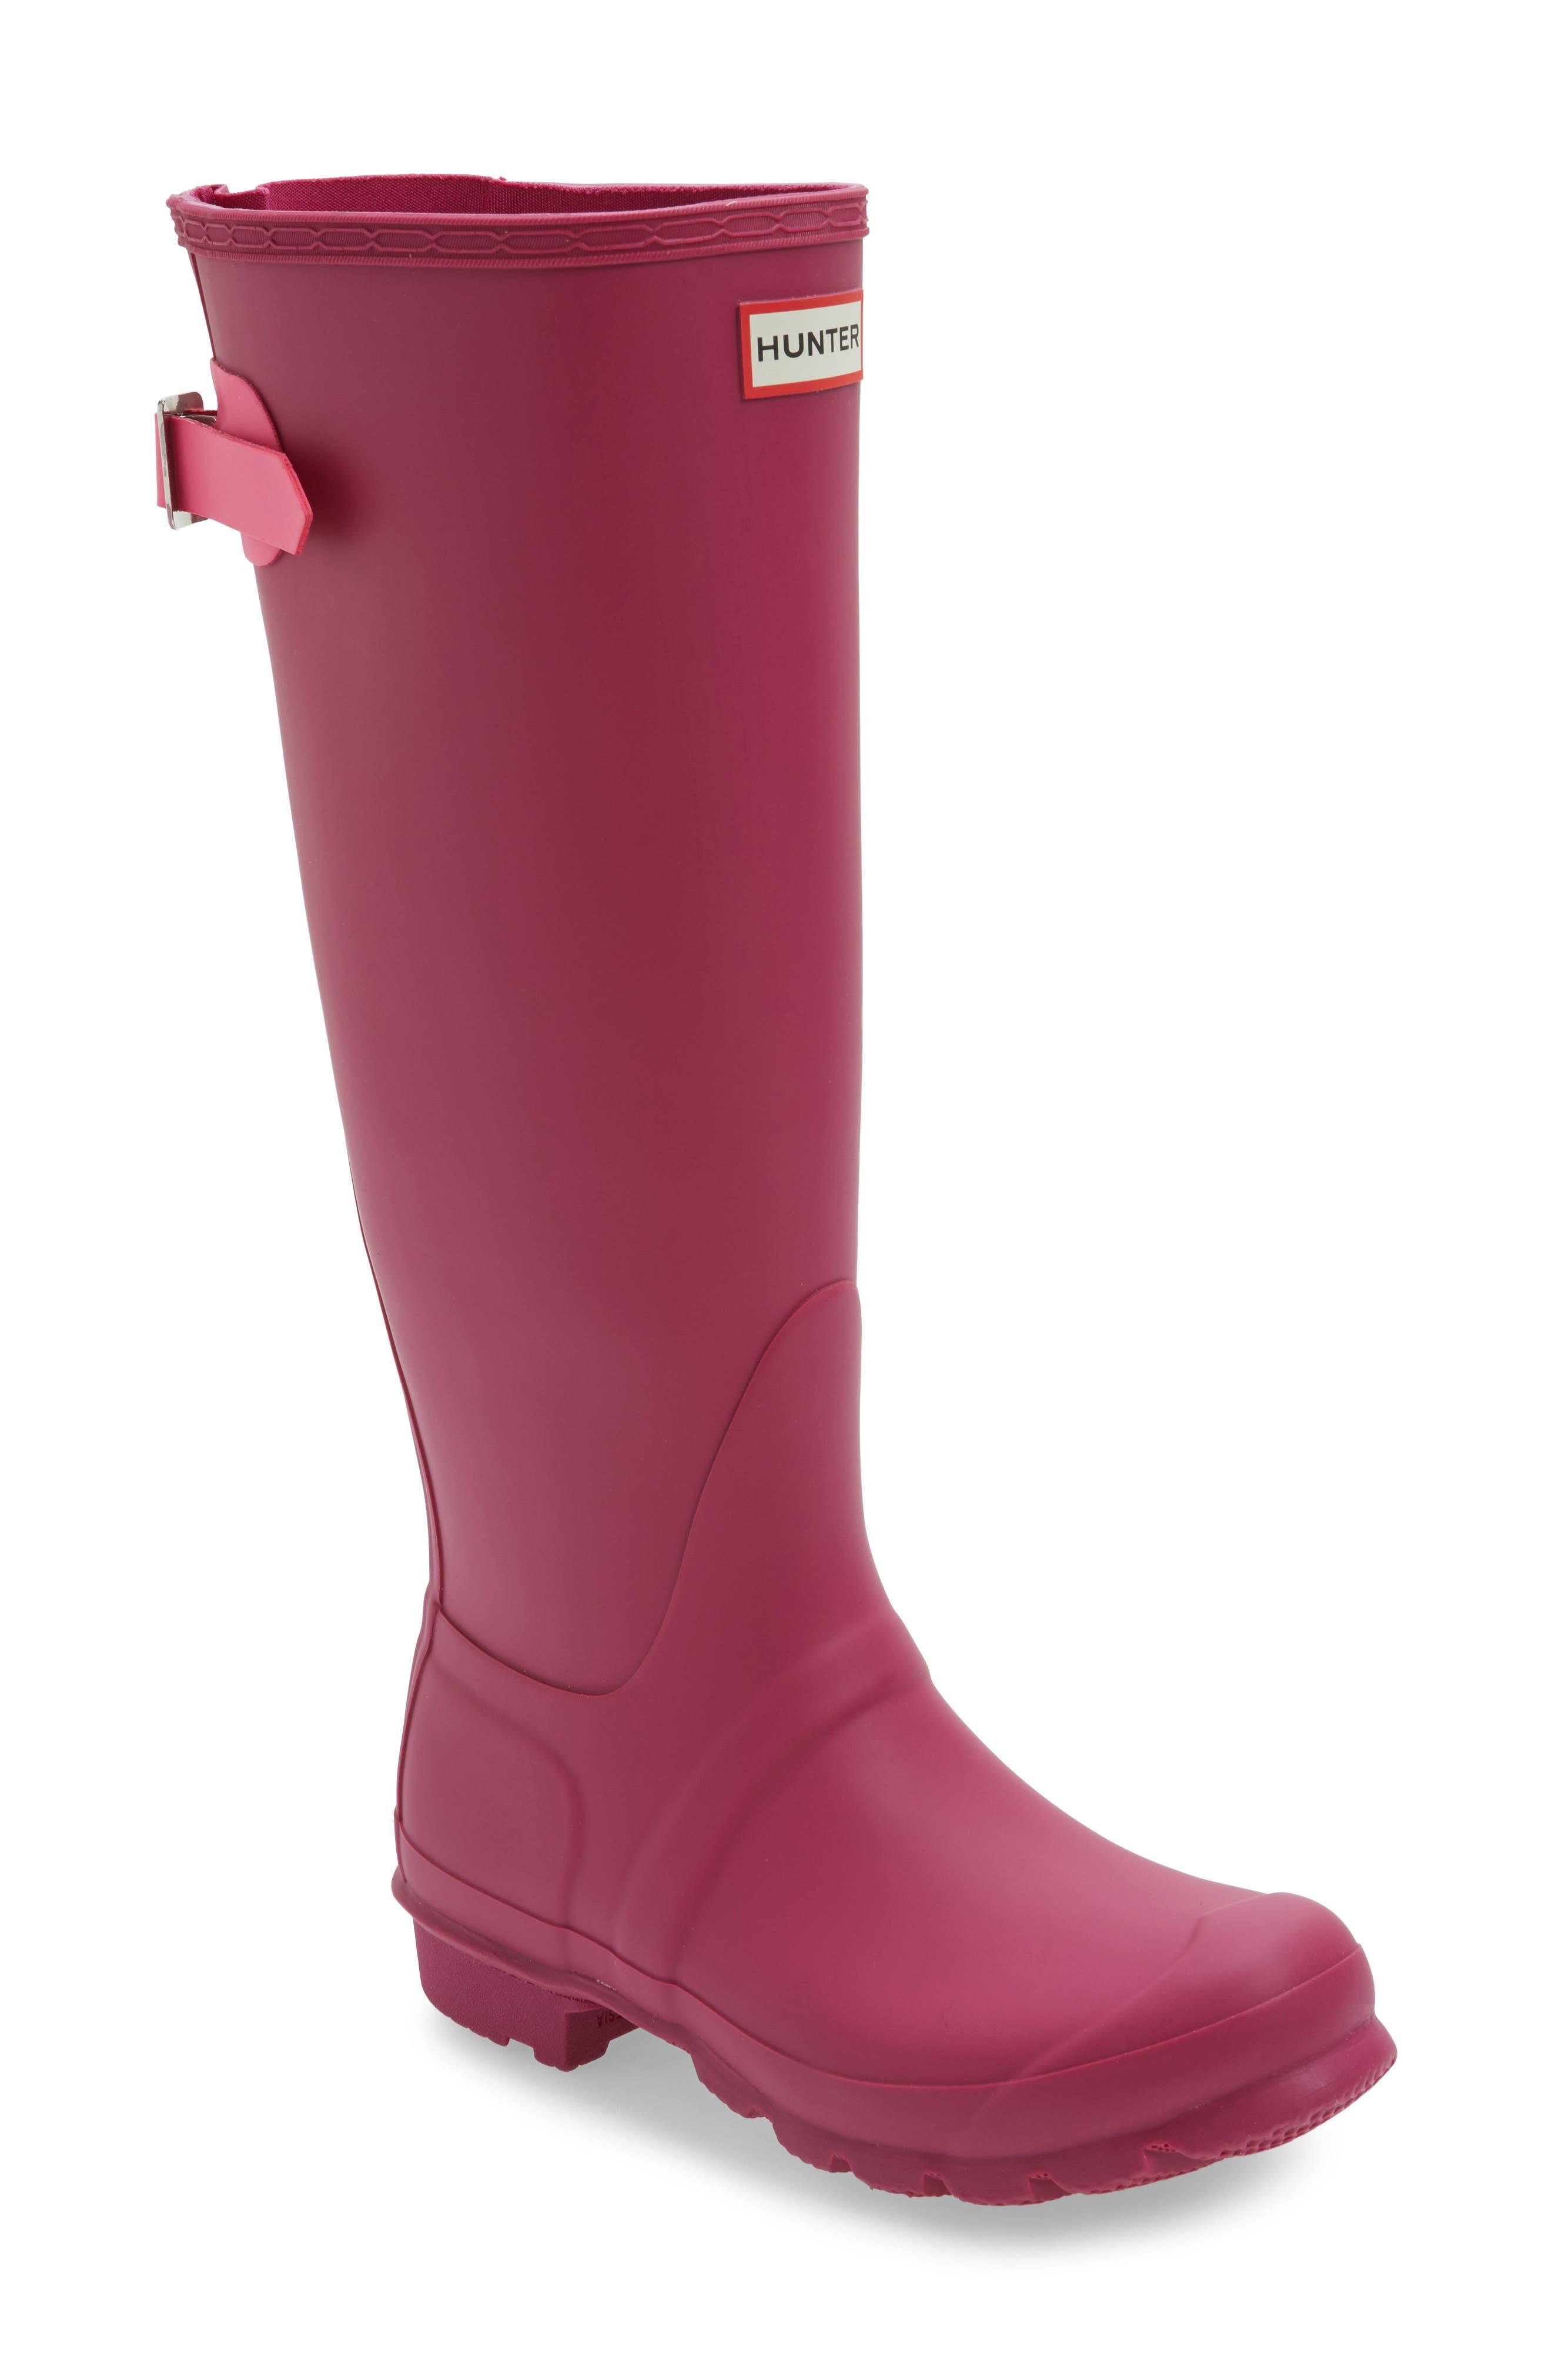 Adjustable Calf Rain Boot,                         Main,                         color, Dark Ion Pink/ Ion Pink